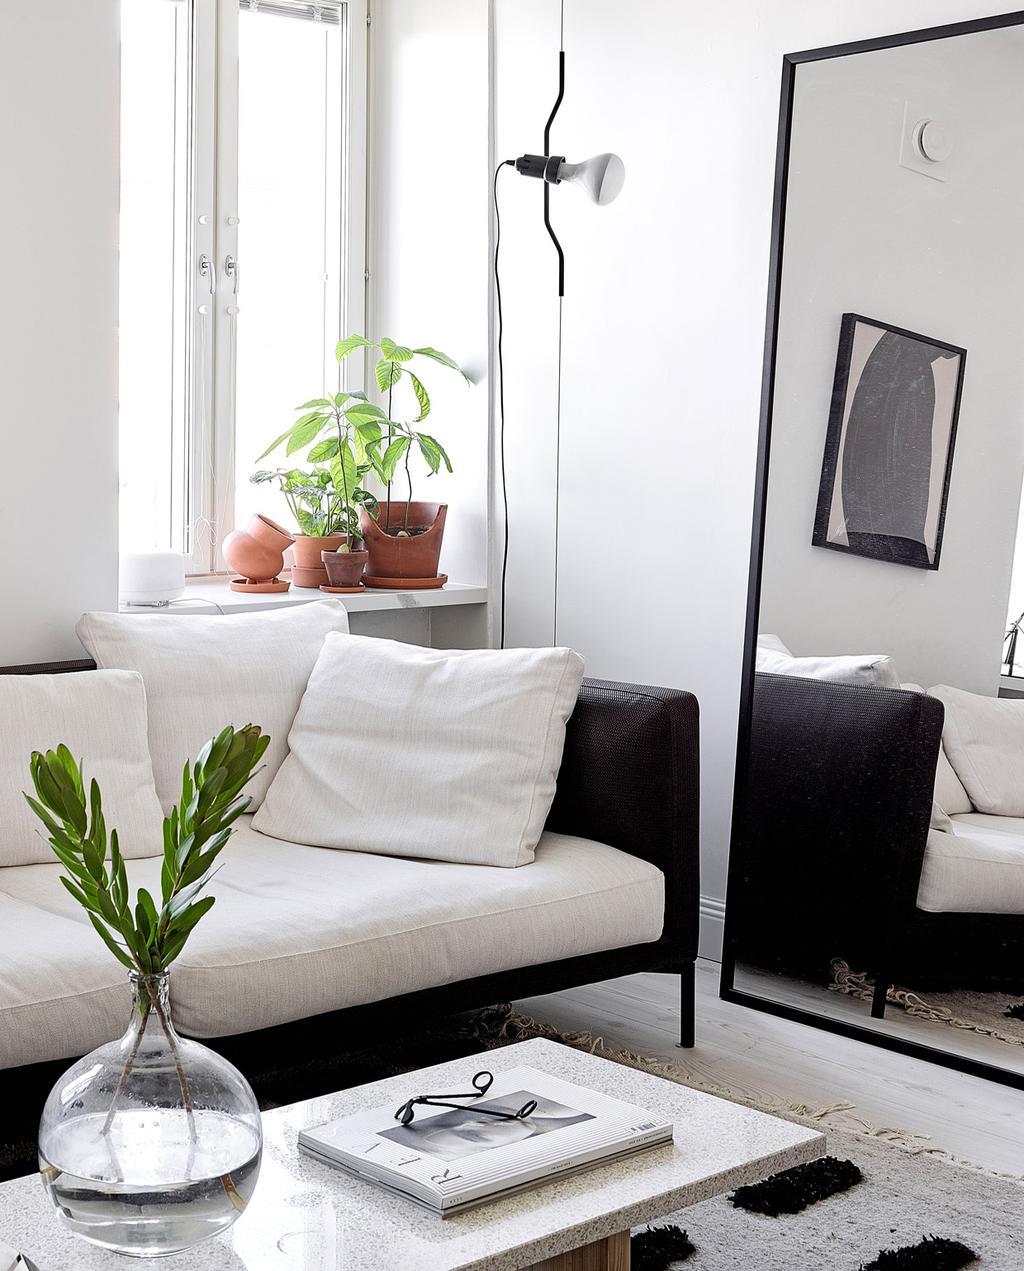 vtwonen special tiny houses | grote spiegel naast zwart witte bank